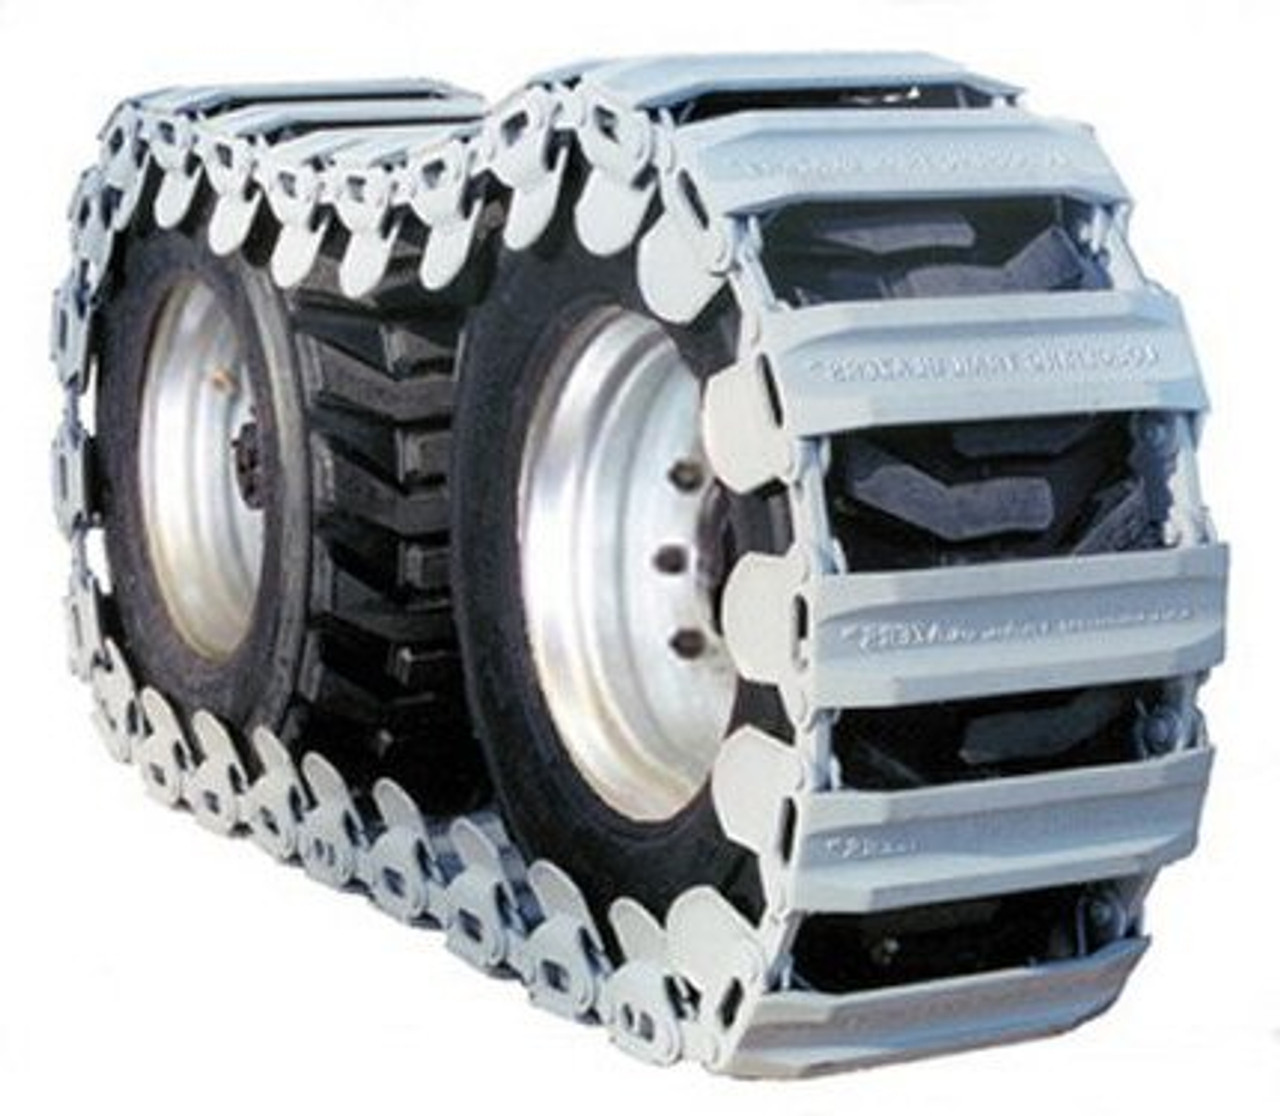 Skid Steer Steel Tracks F Series for 10 x 16.5 Tires